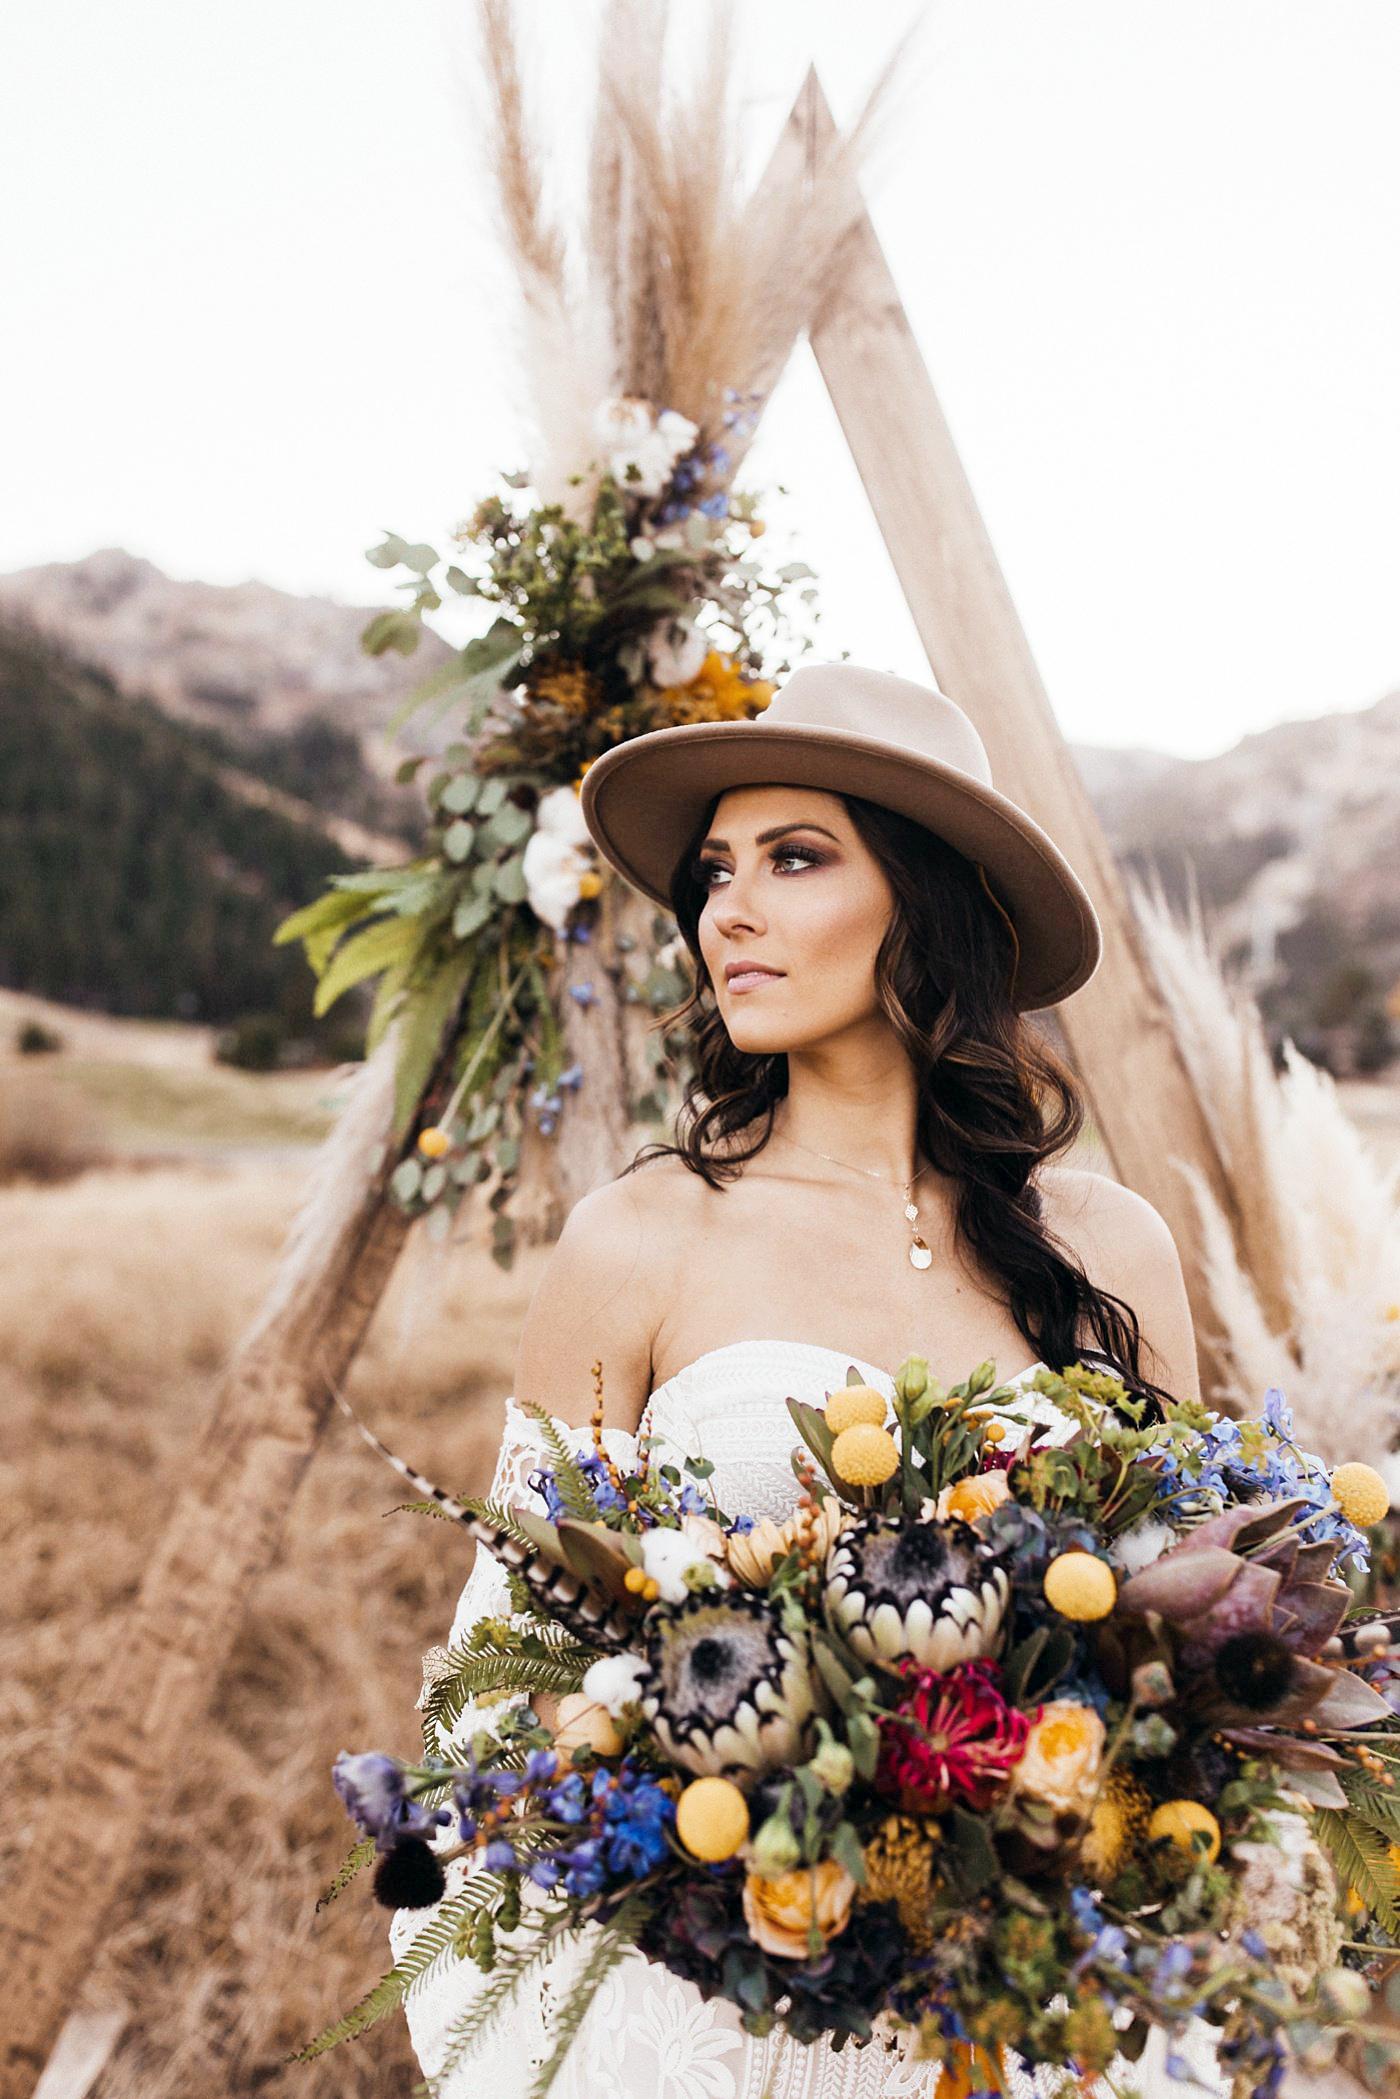 Becca Kufrin Garrett Yrigoyen Pre-Wedding Shoot - Kufrin was a vision in the glamorous shoot, thanks to Dori Ann Designs ' hair and makeup work.